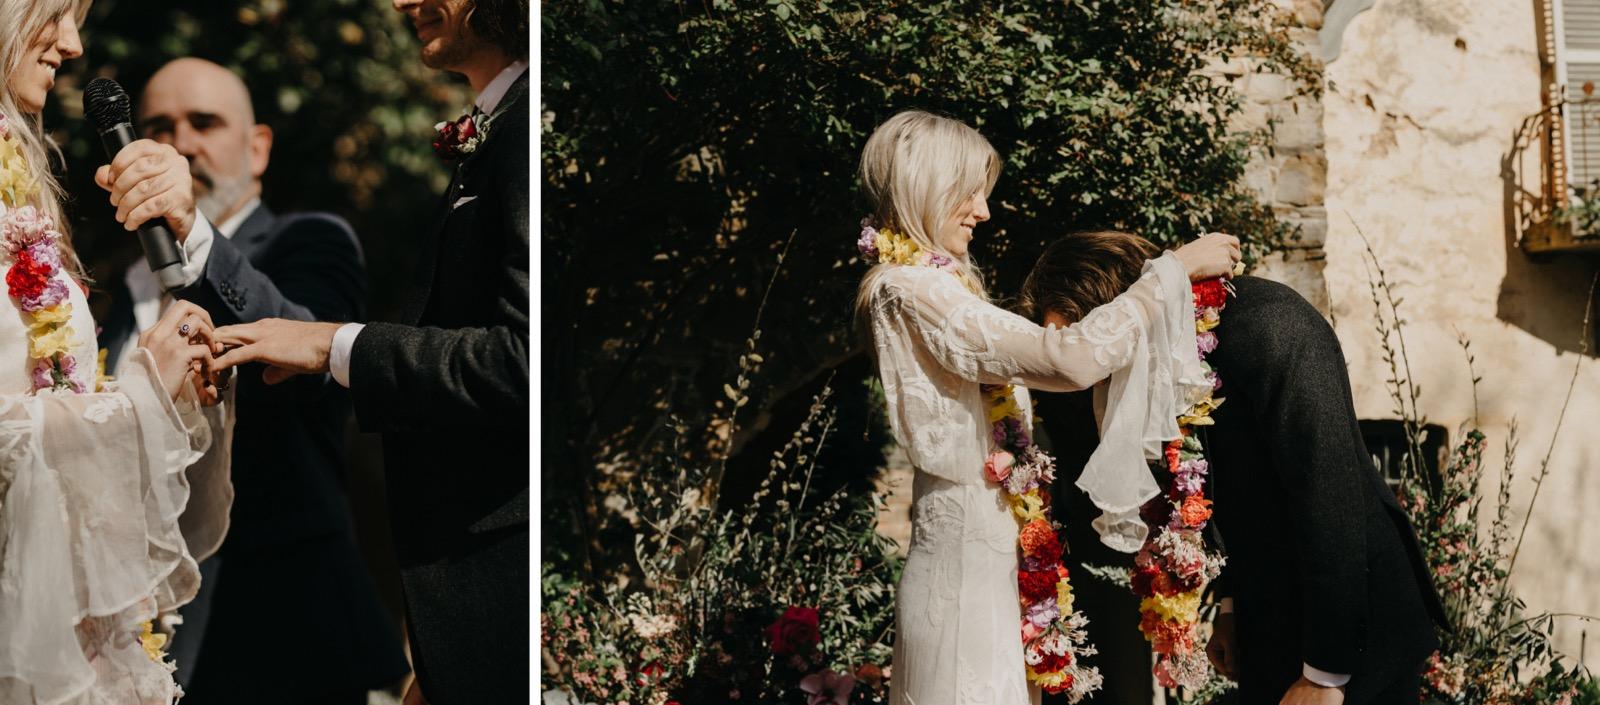 documentary-wedding-photography 00136